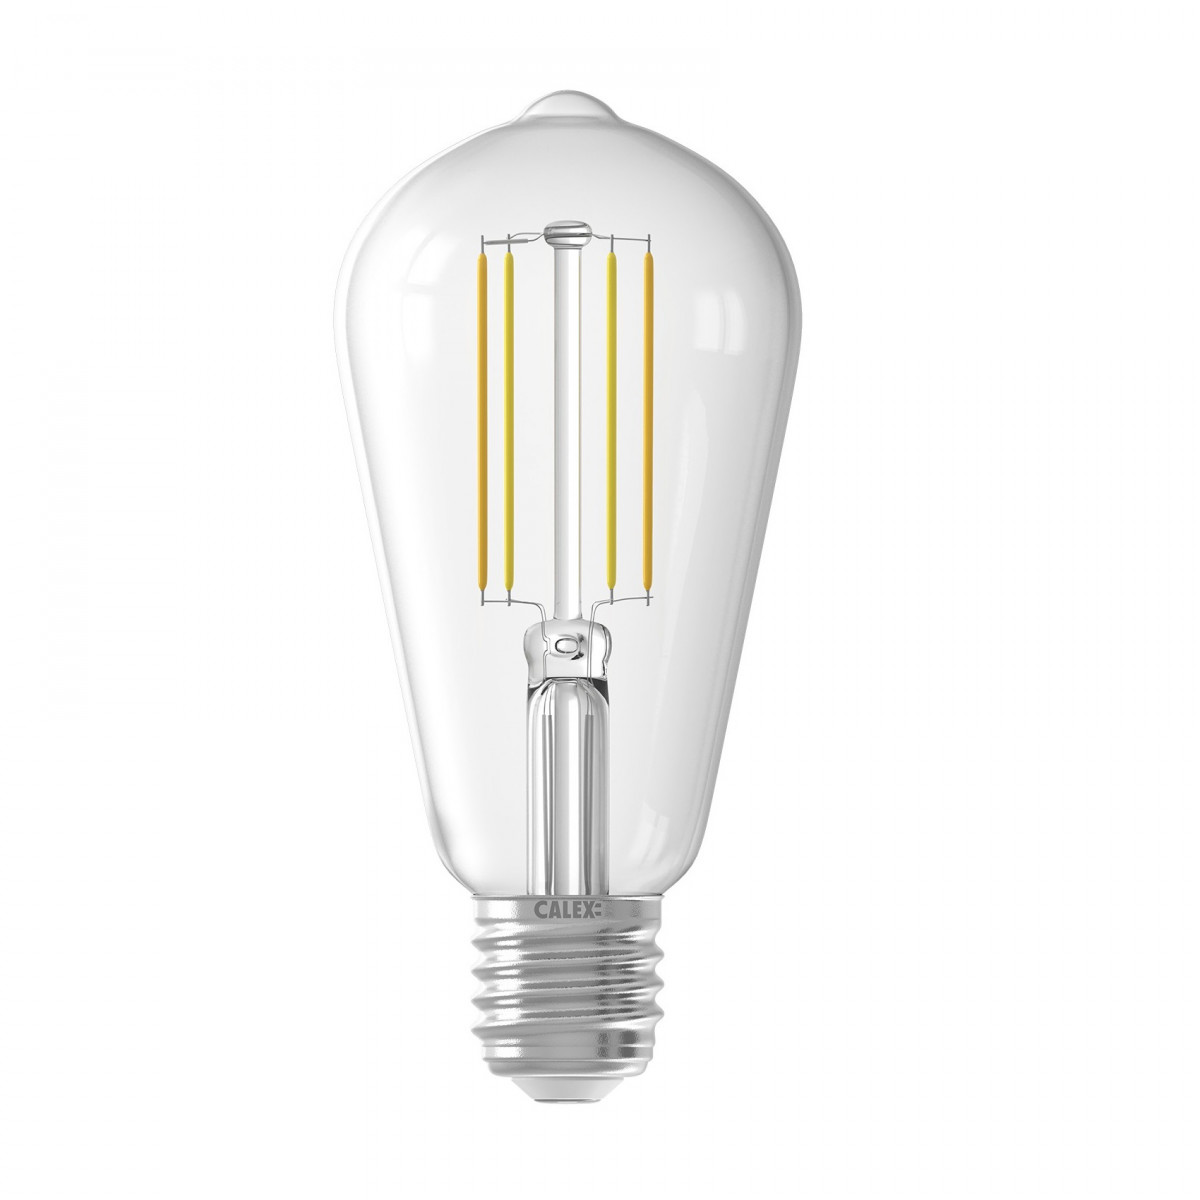 LED lichtbron incl. WIFI ambiance dimmer (429113-LED) - calex - Losse Sensoren en Bewegingsmelders